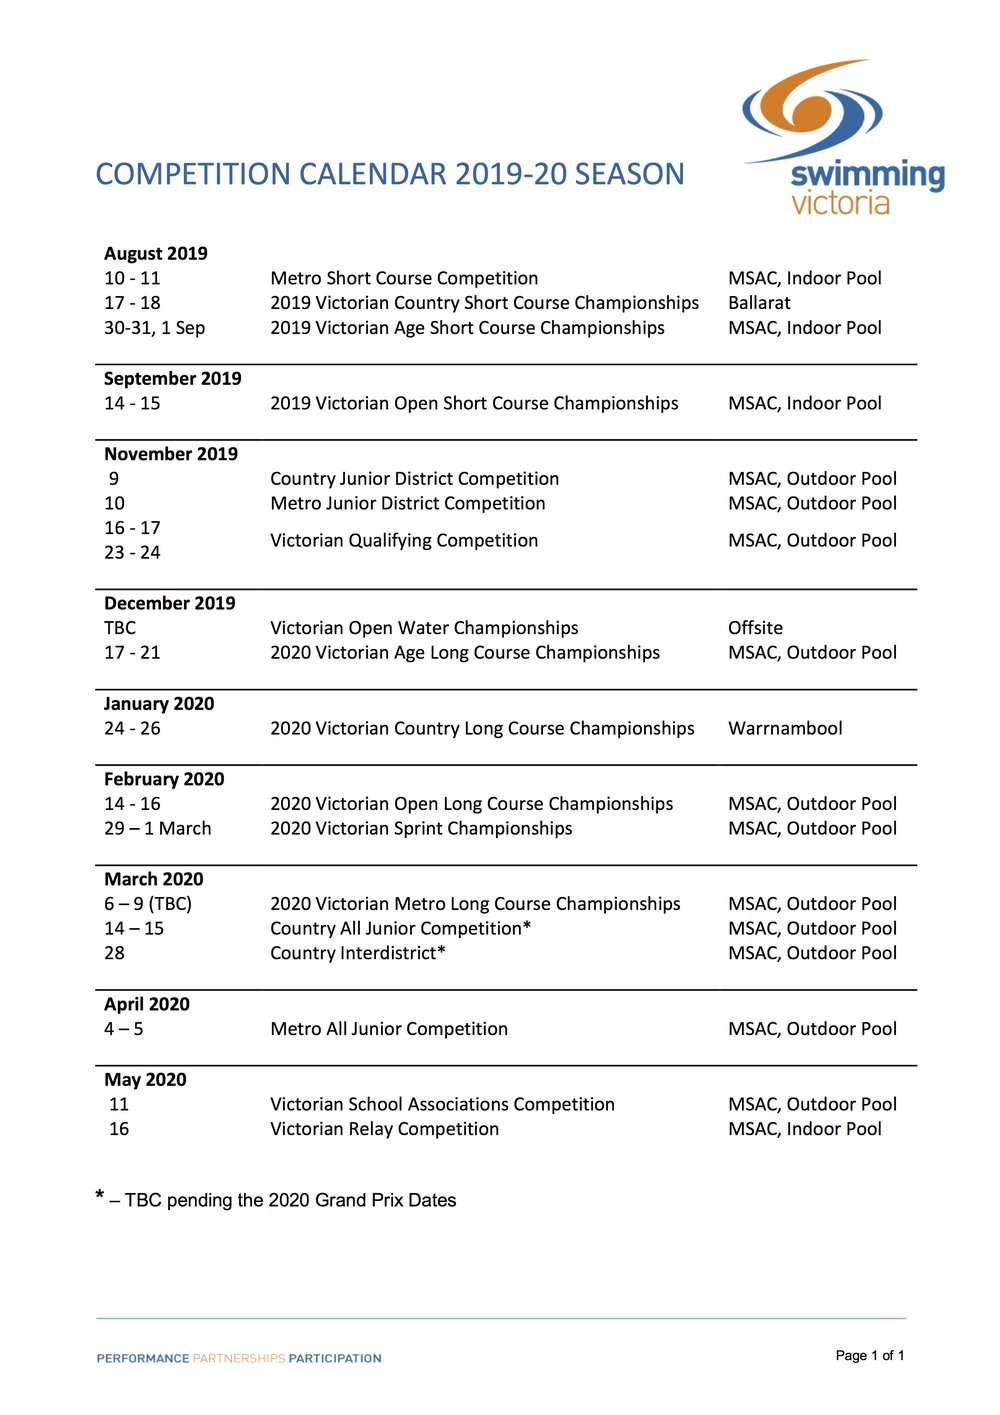 Swimming Victoria Competition Calendar 2019-20.jpg